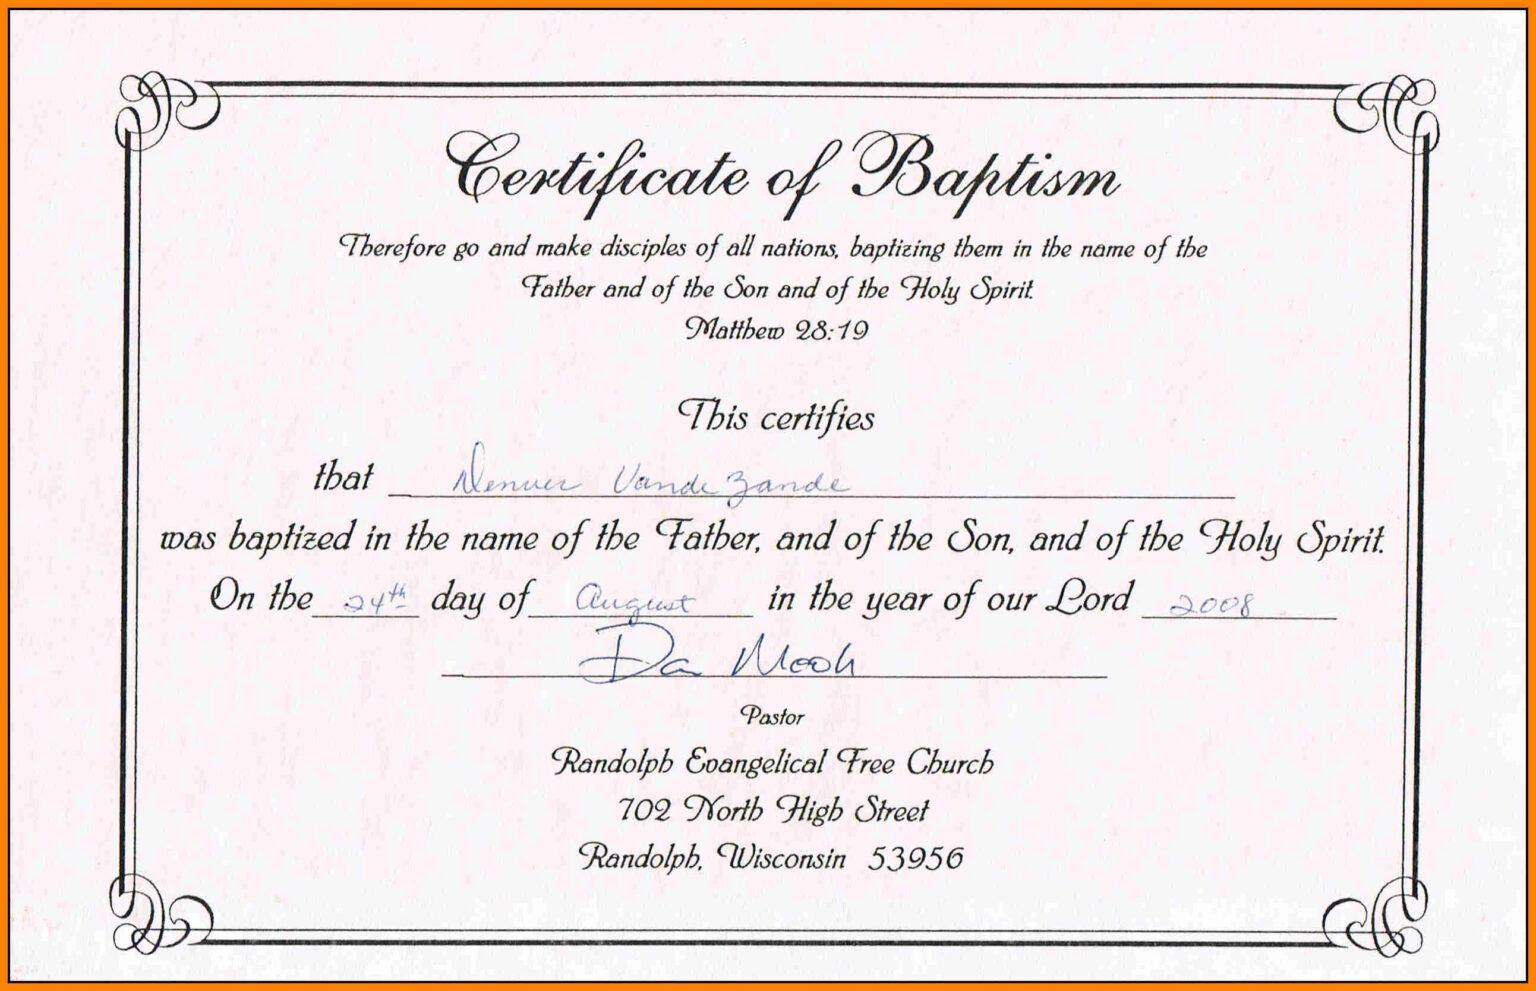 30 United Methodist Baptism Certificate Template Pryncepality Inside Christian Bapti Certificate Templates Baby Dedication Certificate Printable Certificates